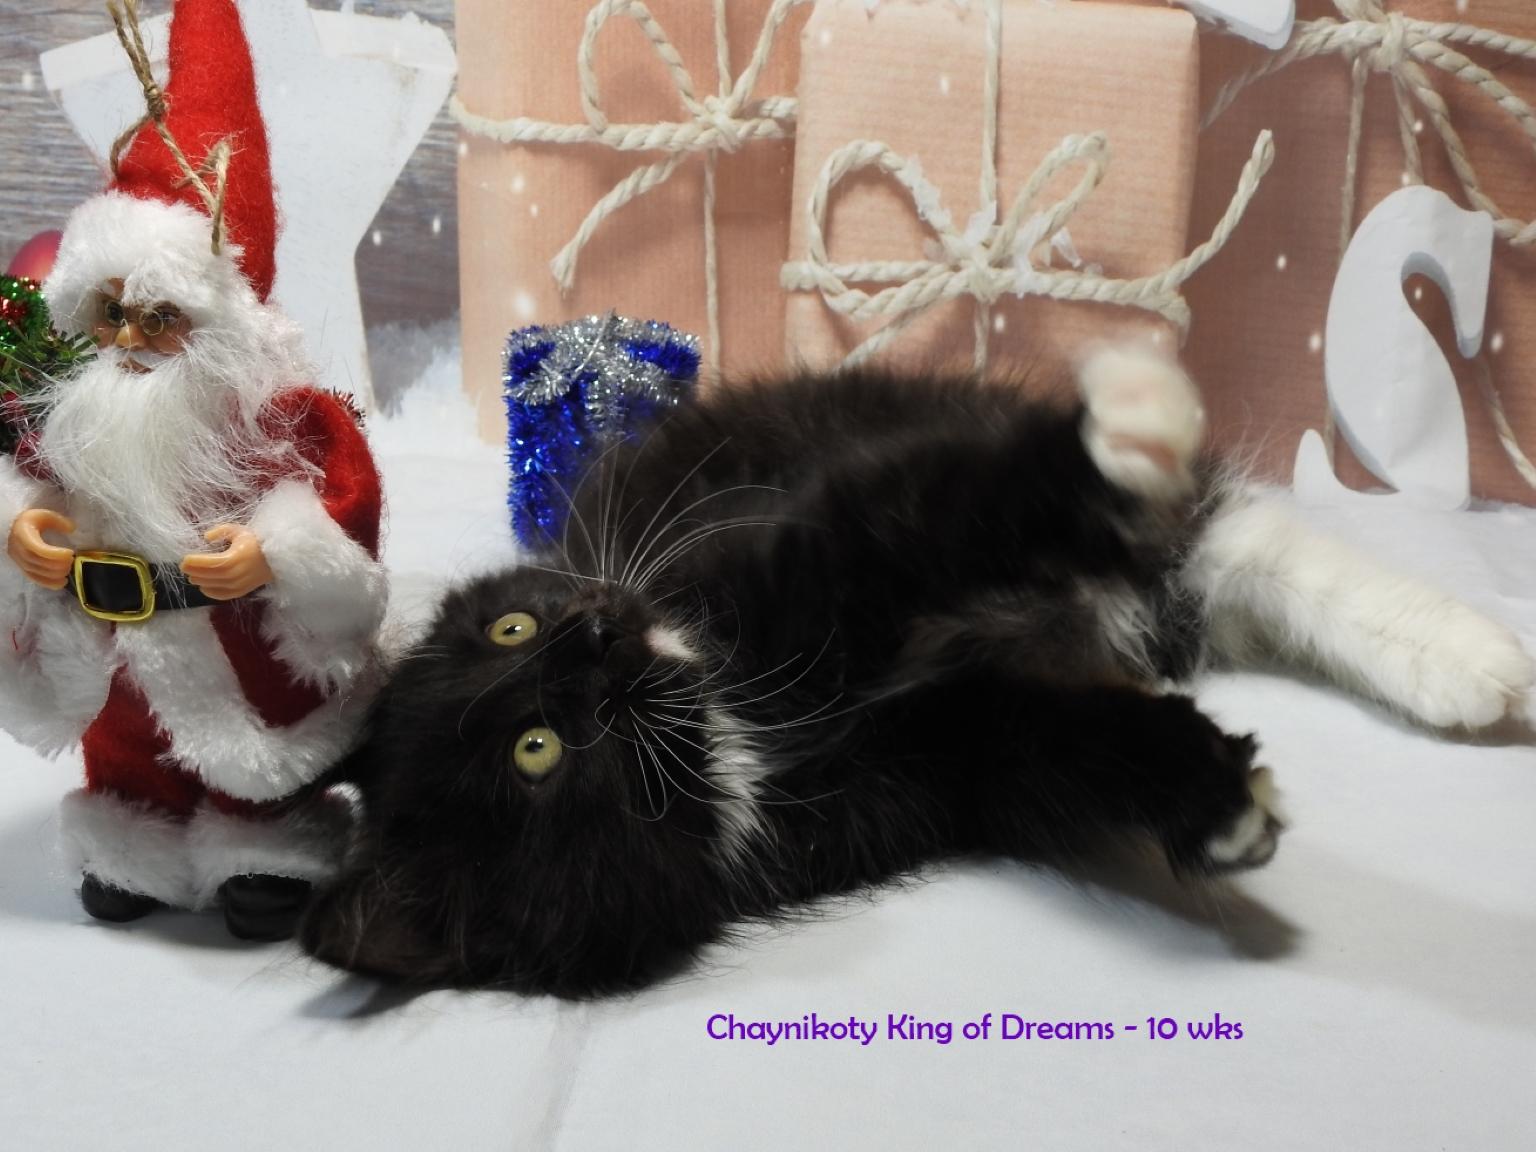 Chaynikoty King of Dreams